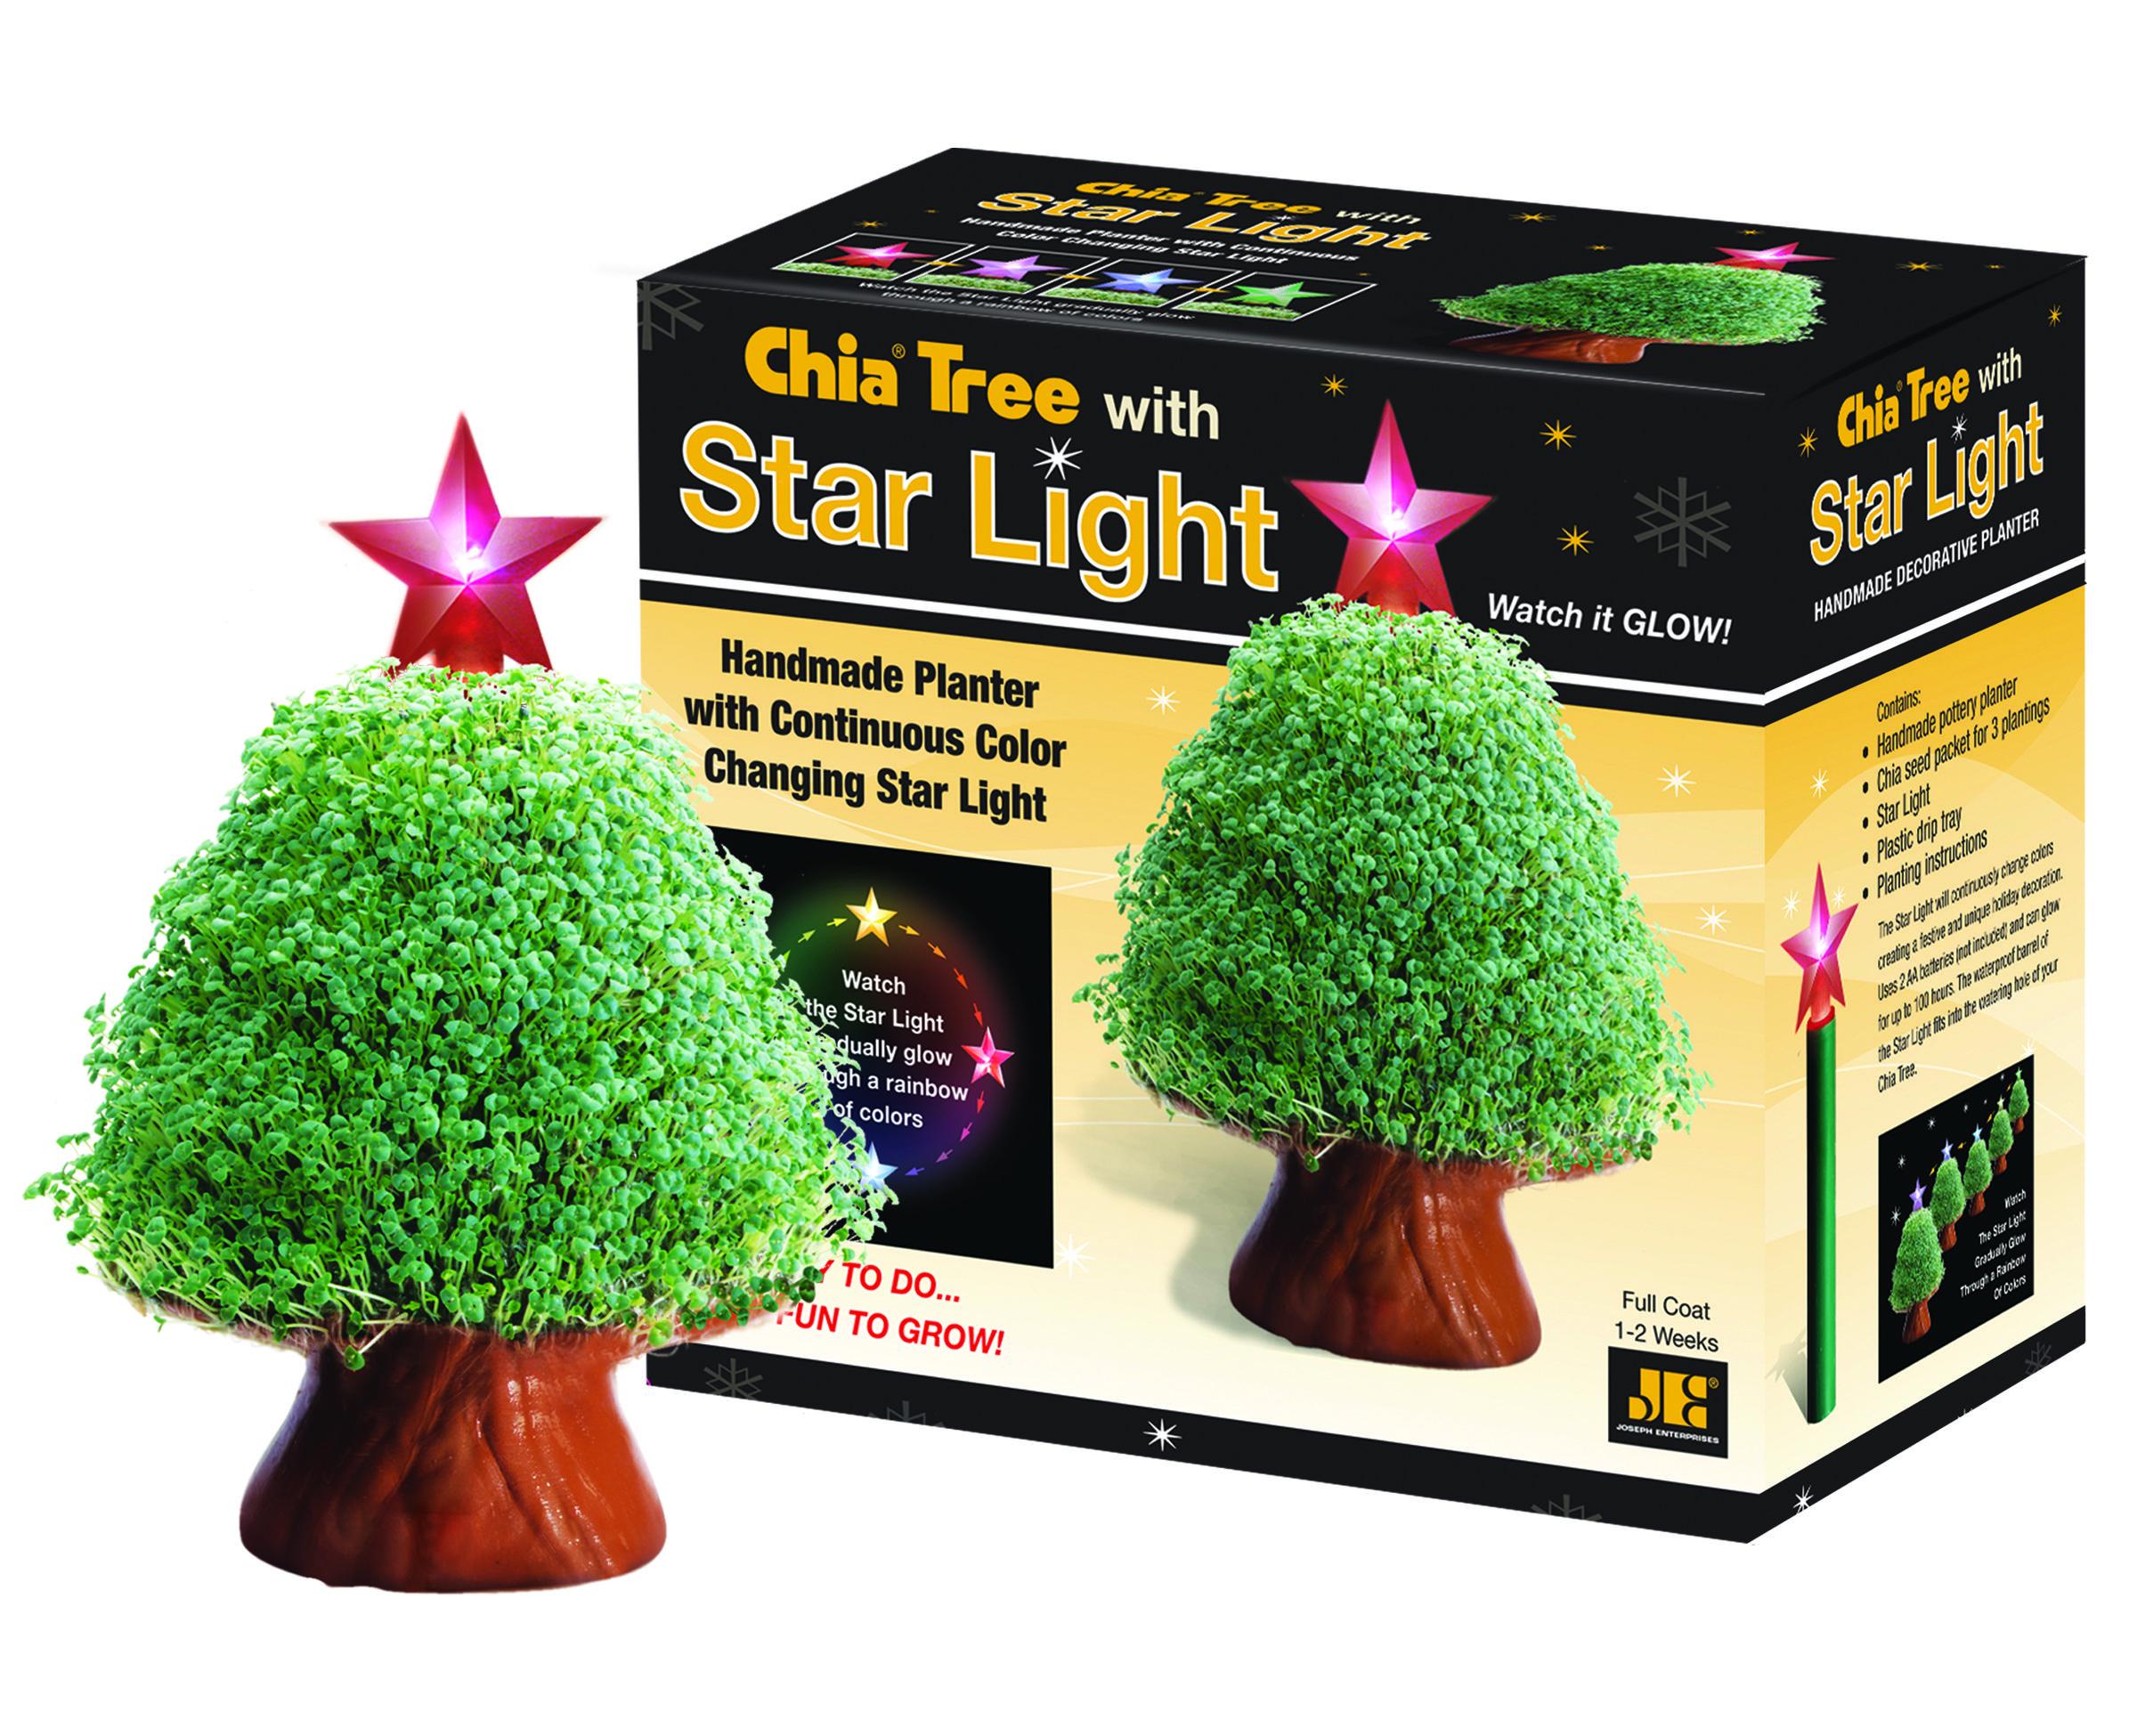 Chia Tree With Starlight Chia Pet Handmade Planter Indoor Flower Pots